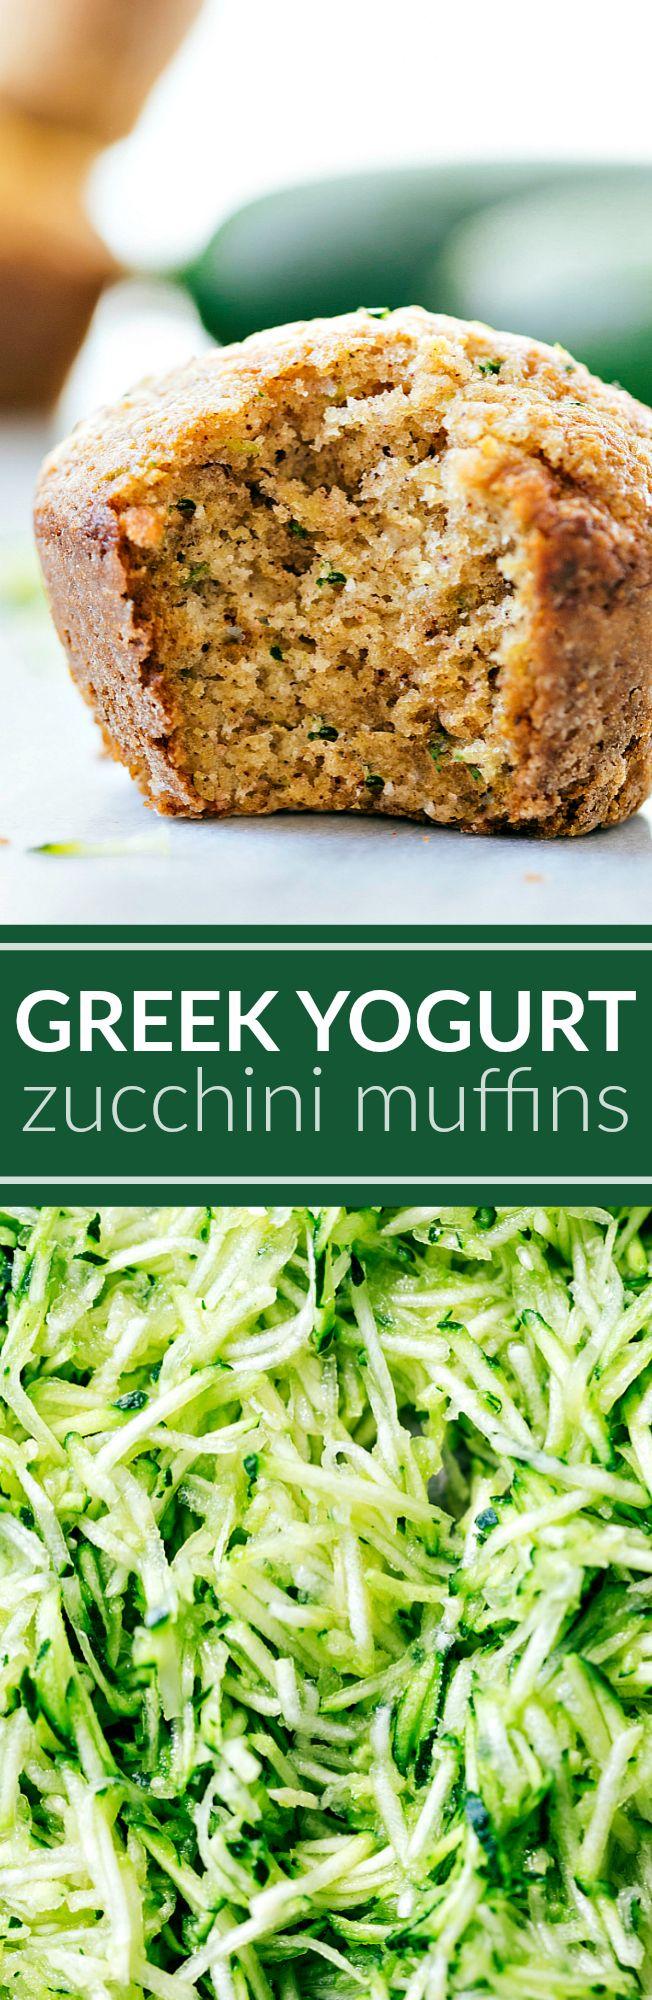 Healthier Greek Yogurt Zucchini Muffins made with better-for-you ingredients like Greek yogurt, mashed banana, honey, oats, and of course zucchini.